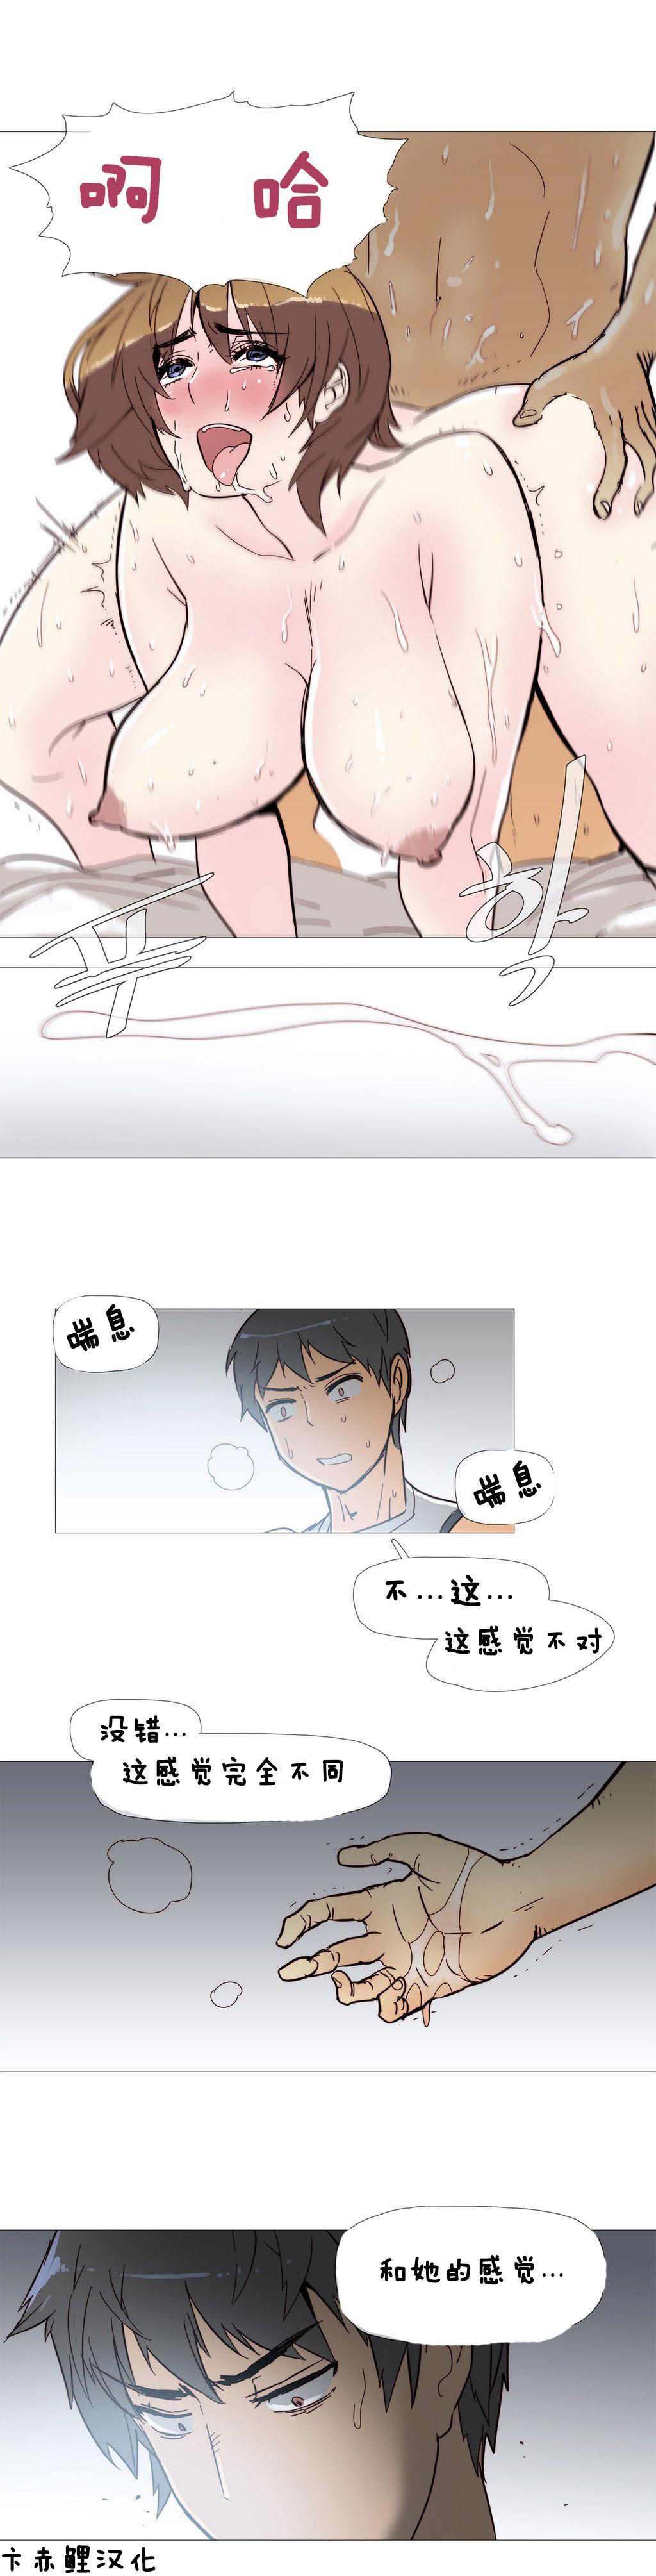 HouseHold Affairs 【卞赤鲤个人汉化】1~21话(持续更新中) 56